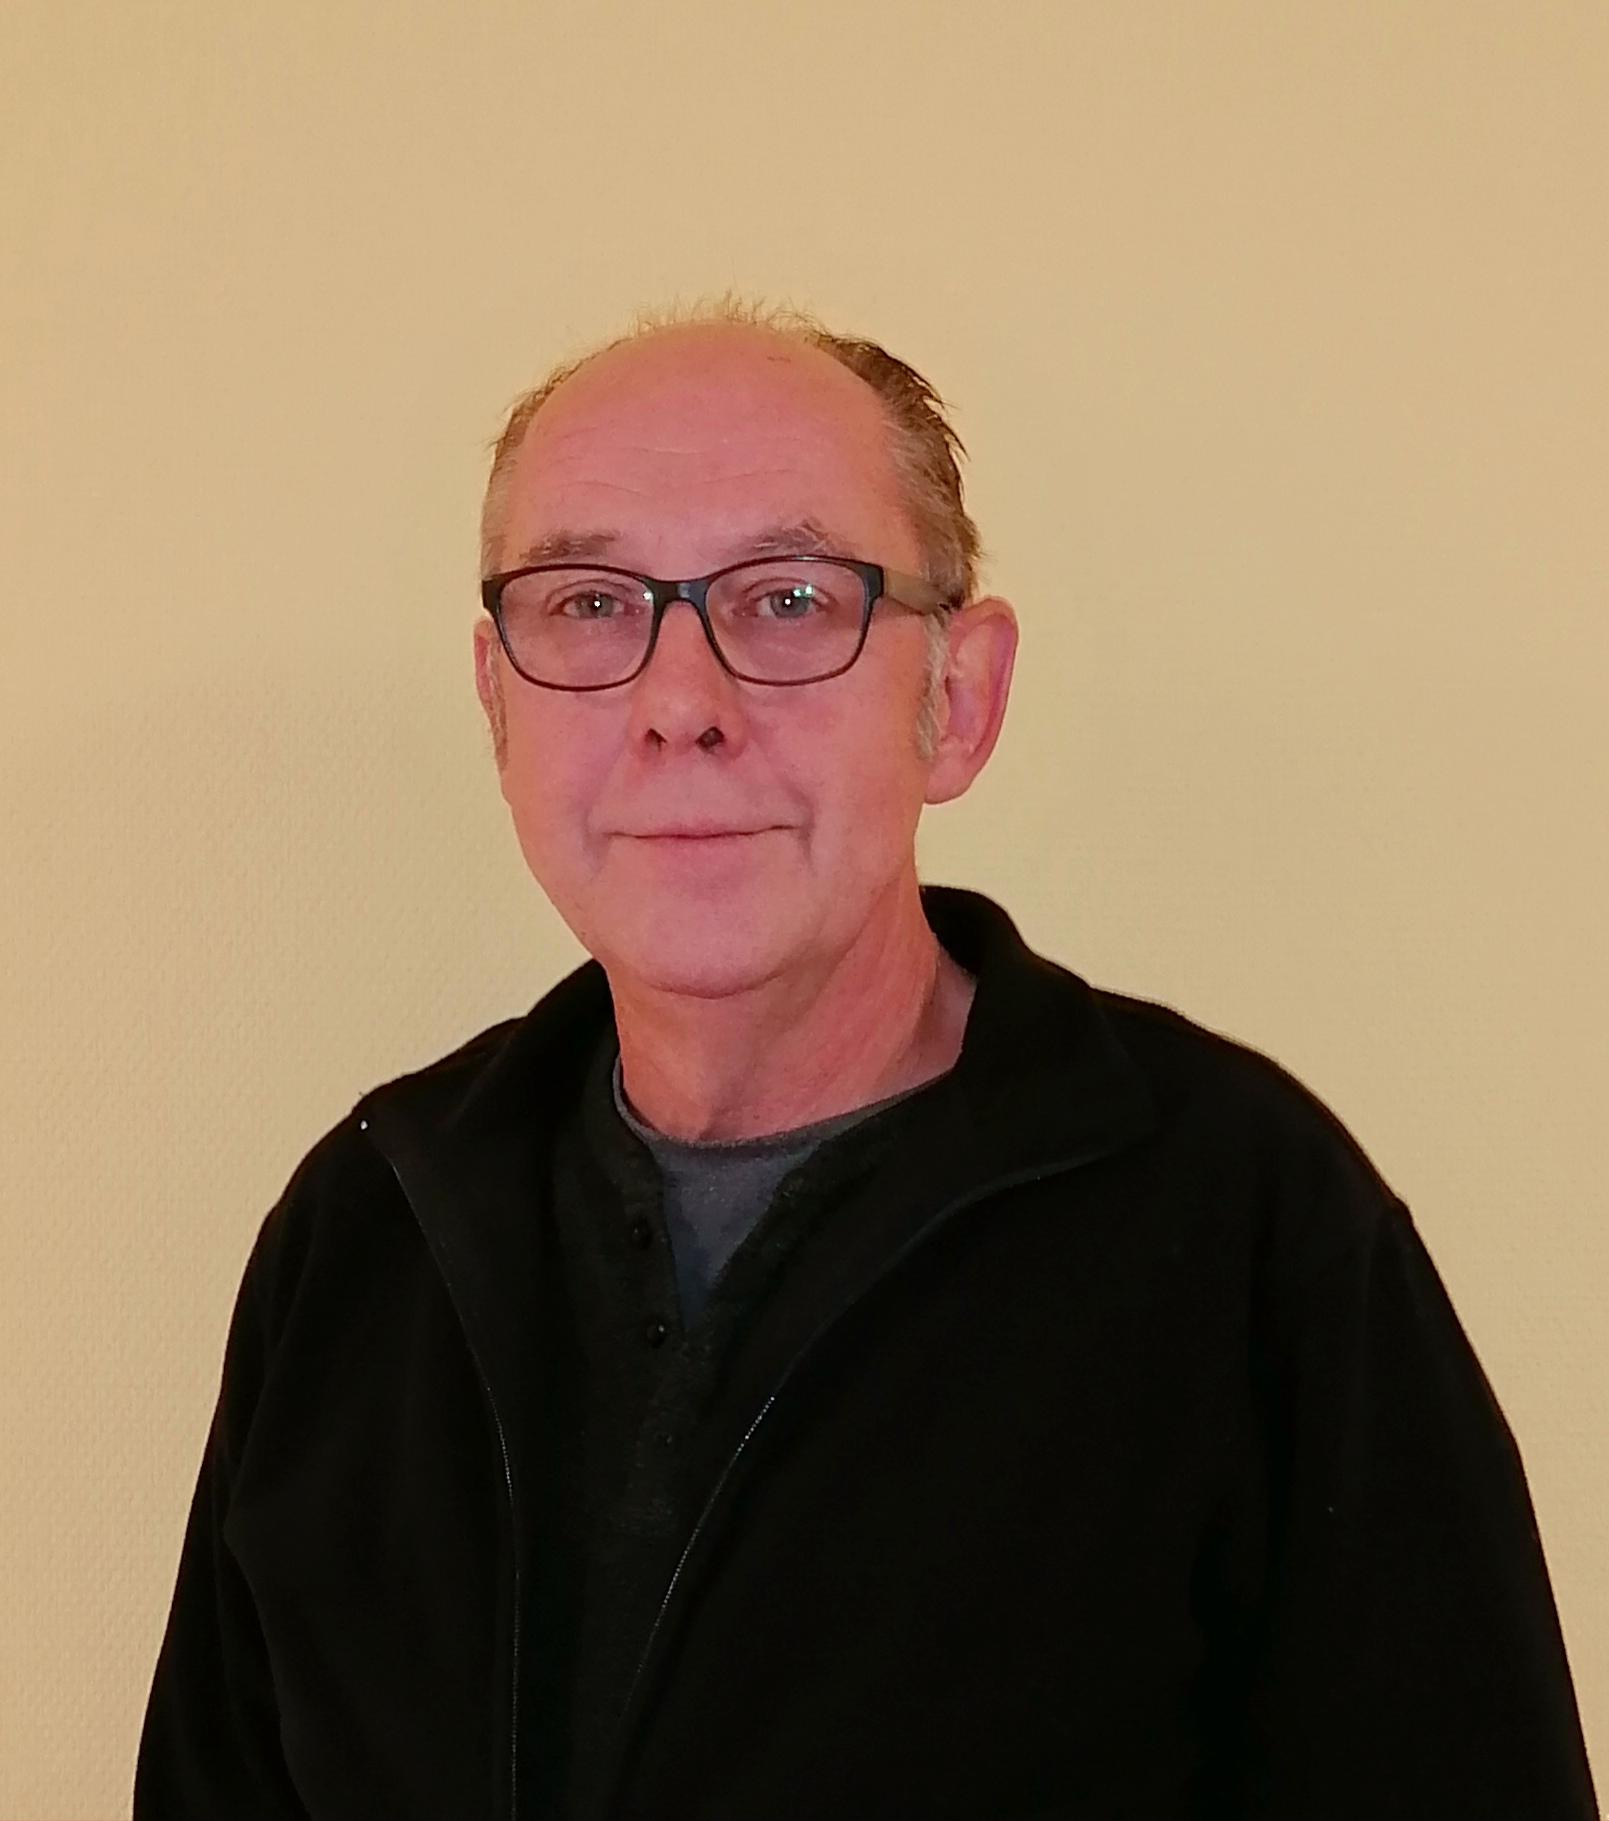 Andreas Putz